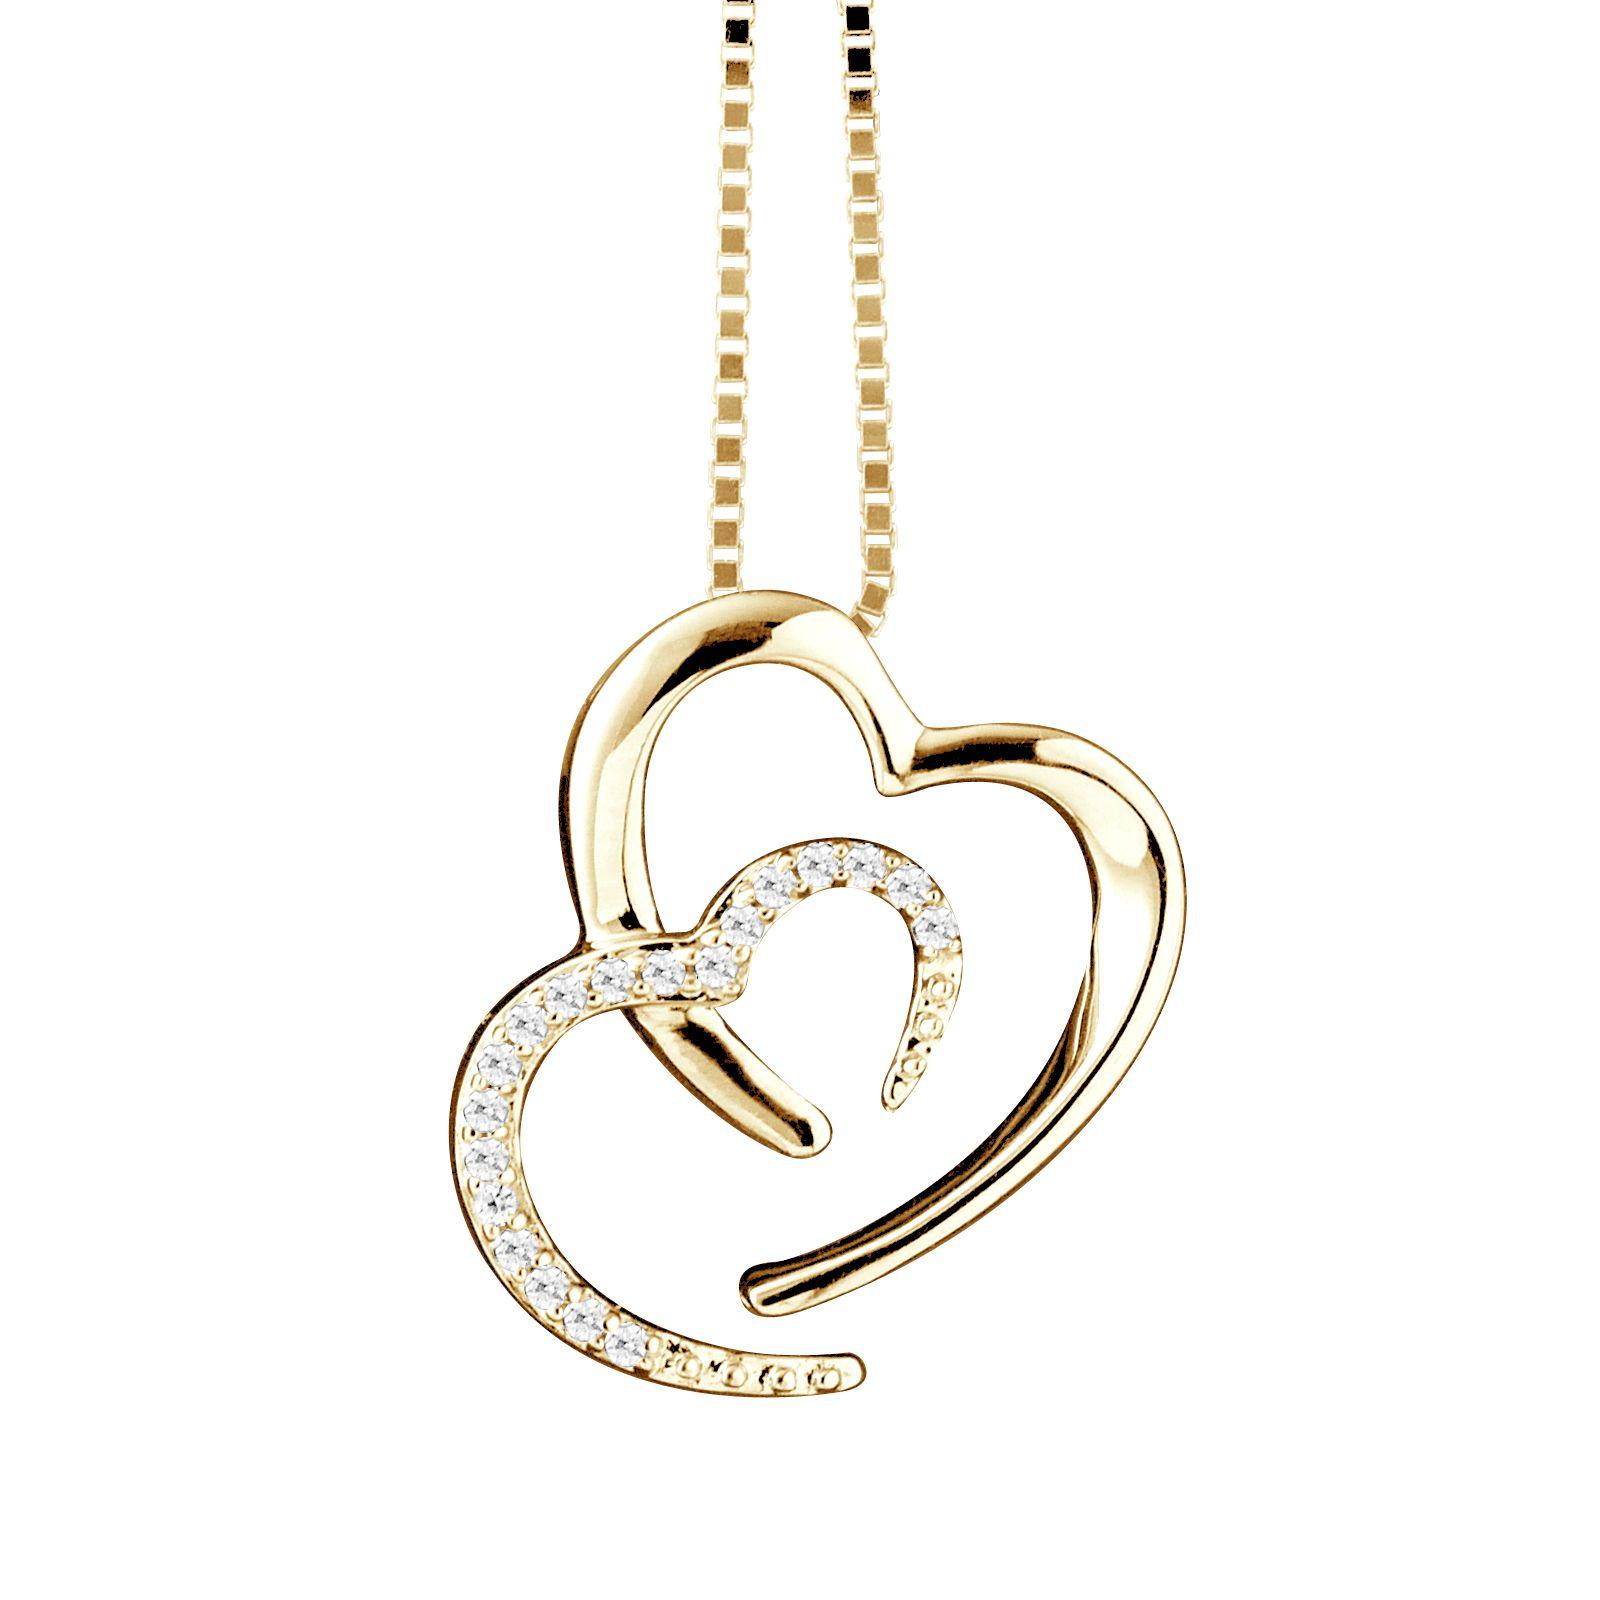 DIADEMA - Necklace Two Hearts - Prestige Jewelery - Diamonds - Chain Yellow Gold